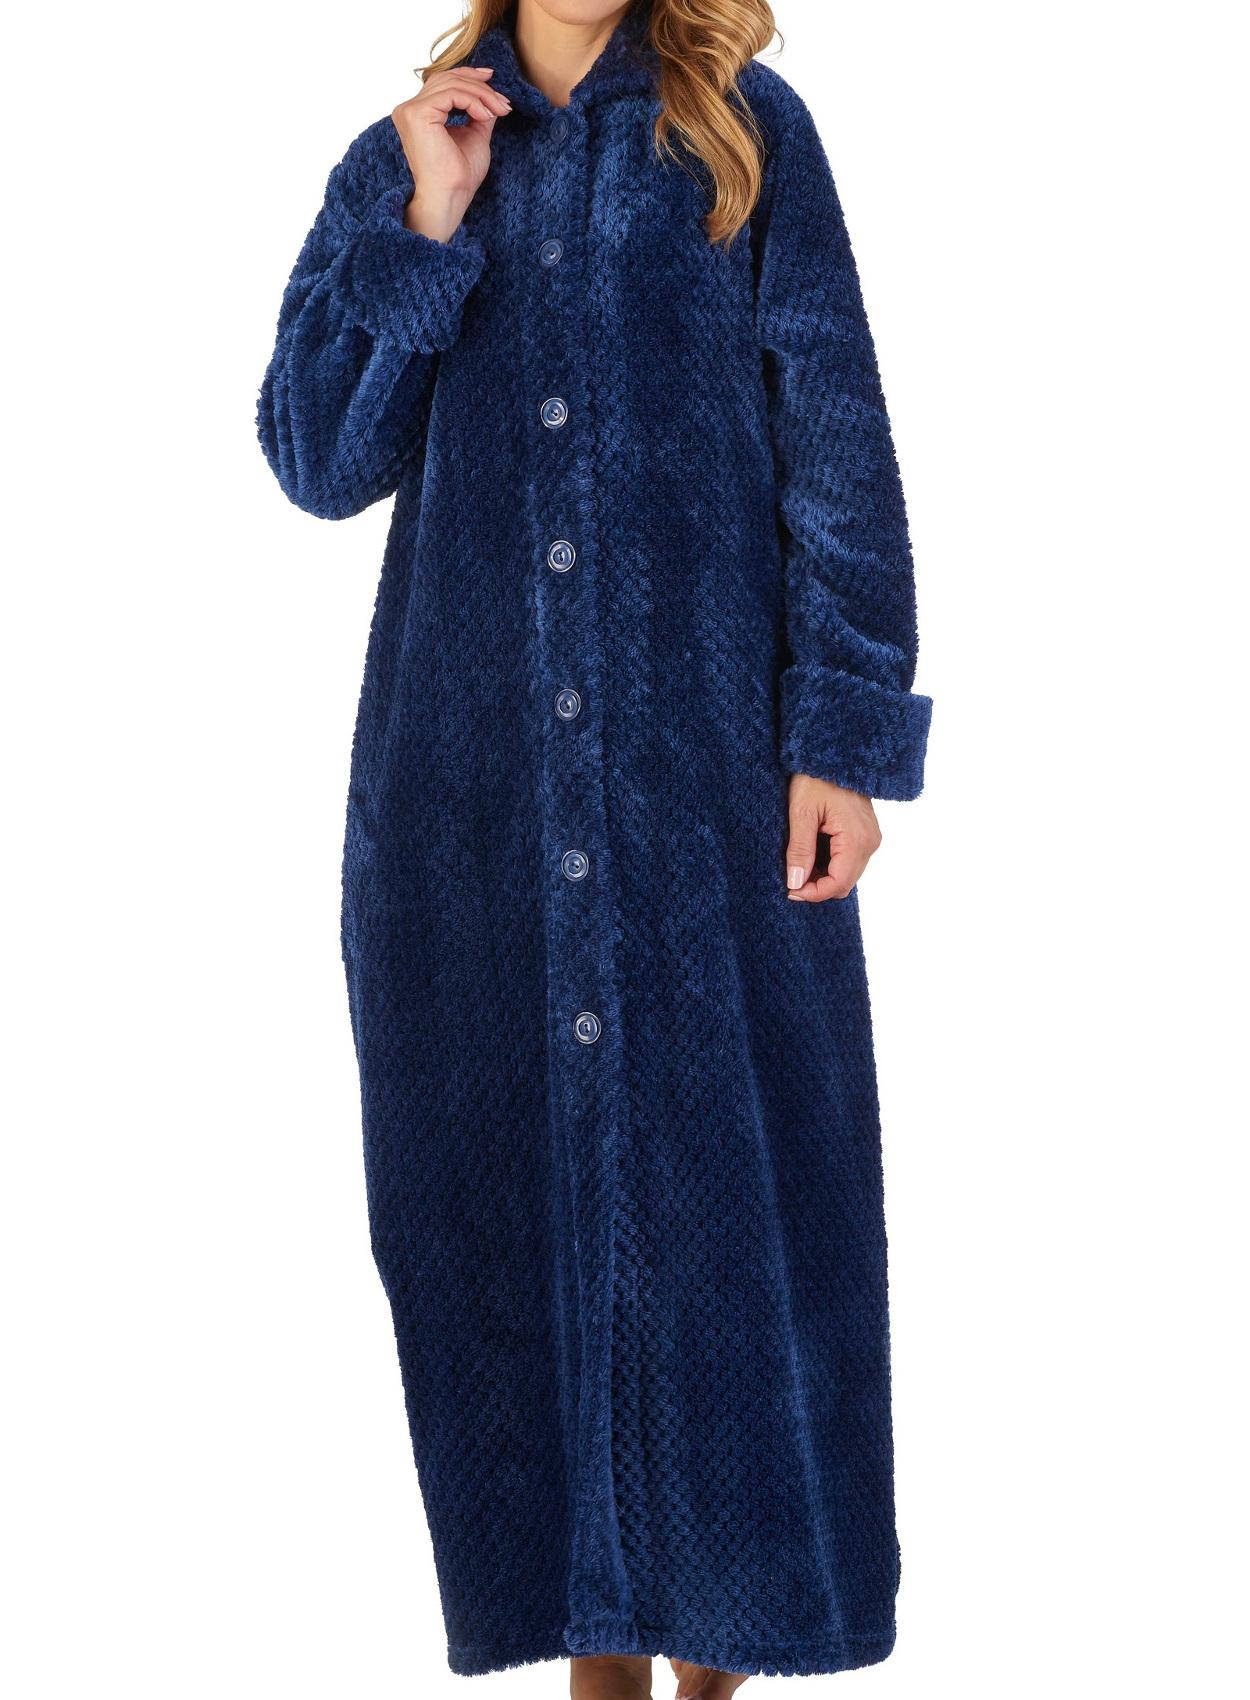 Dressing Gown Ladies Button Up Waffle Flannel Fleece Slenderella Nightwear Robe